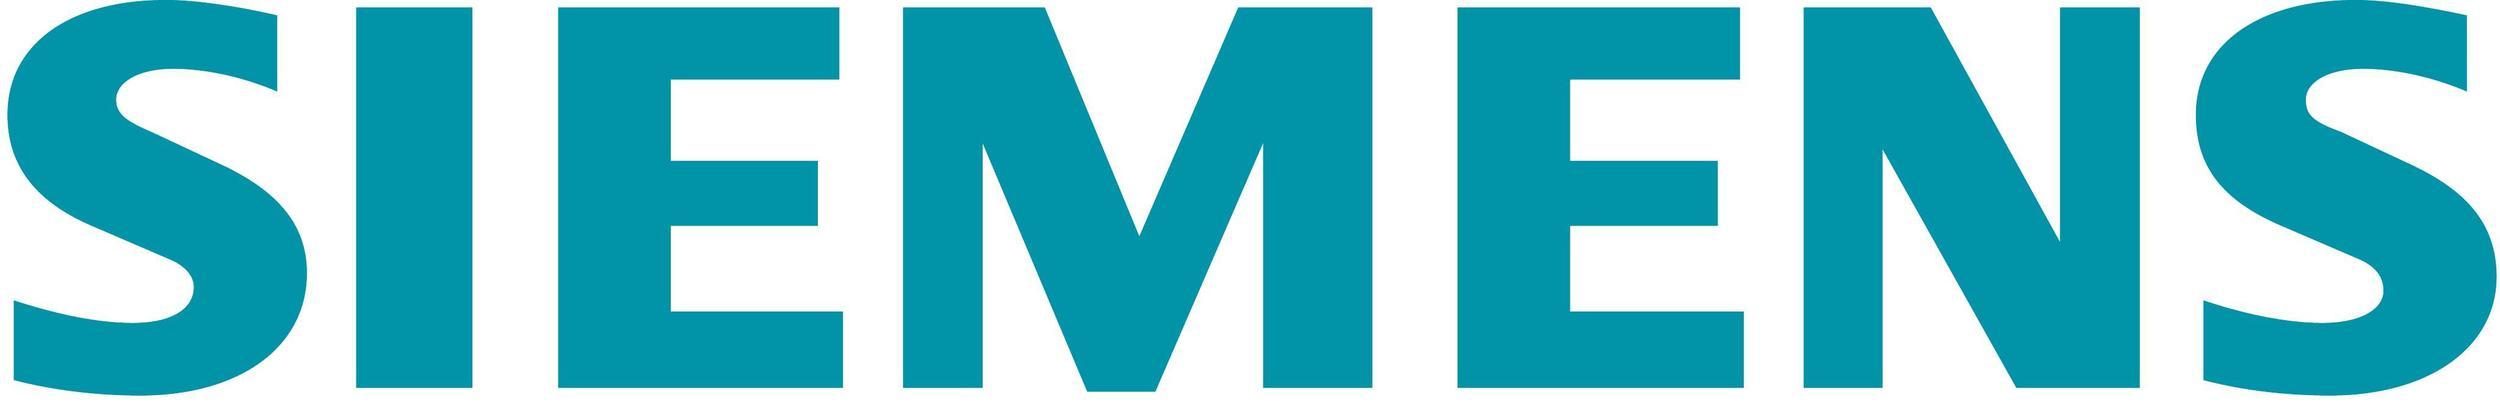 siemens-logo-2.jpg